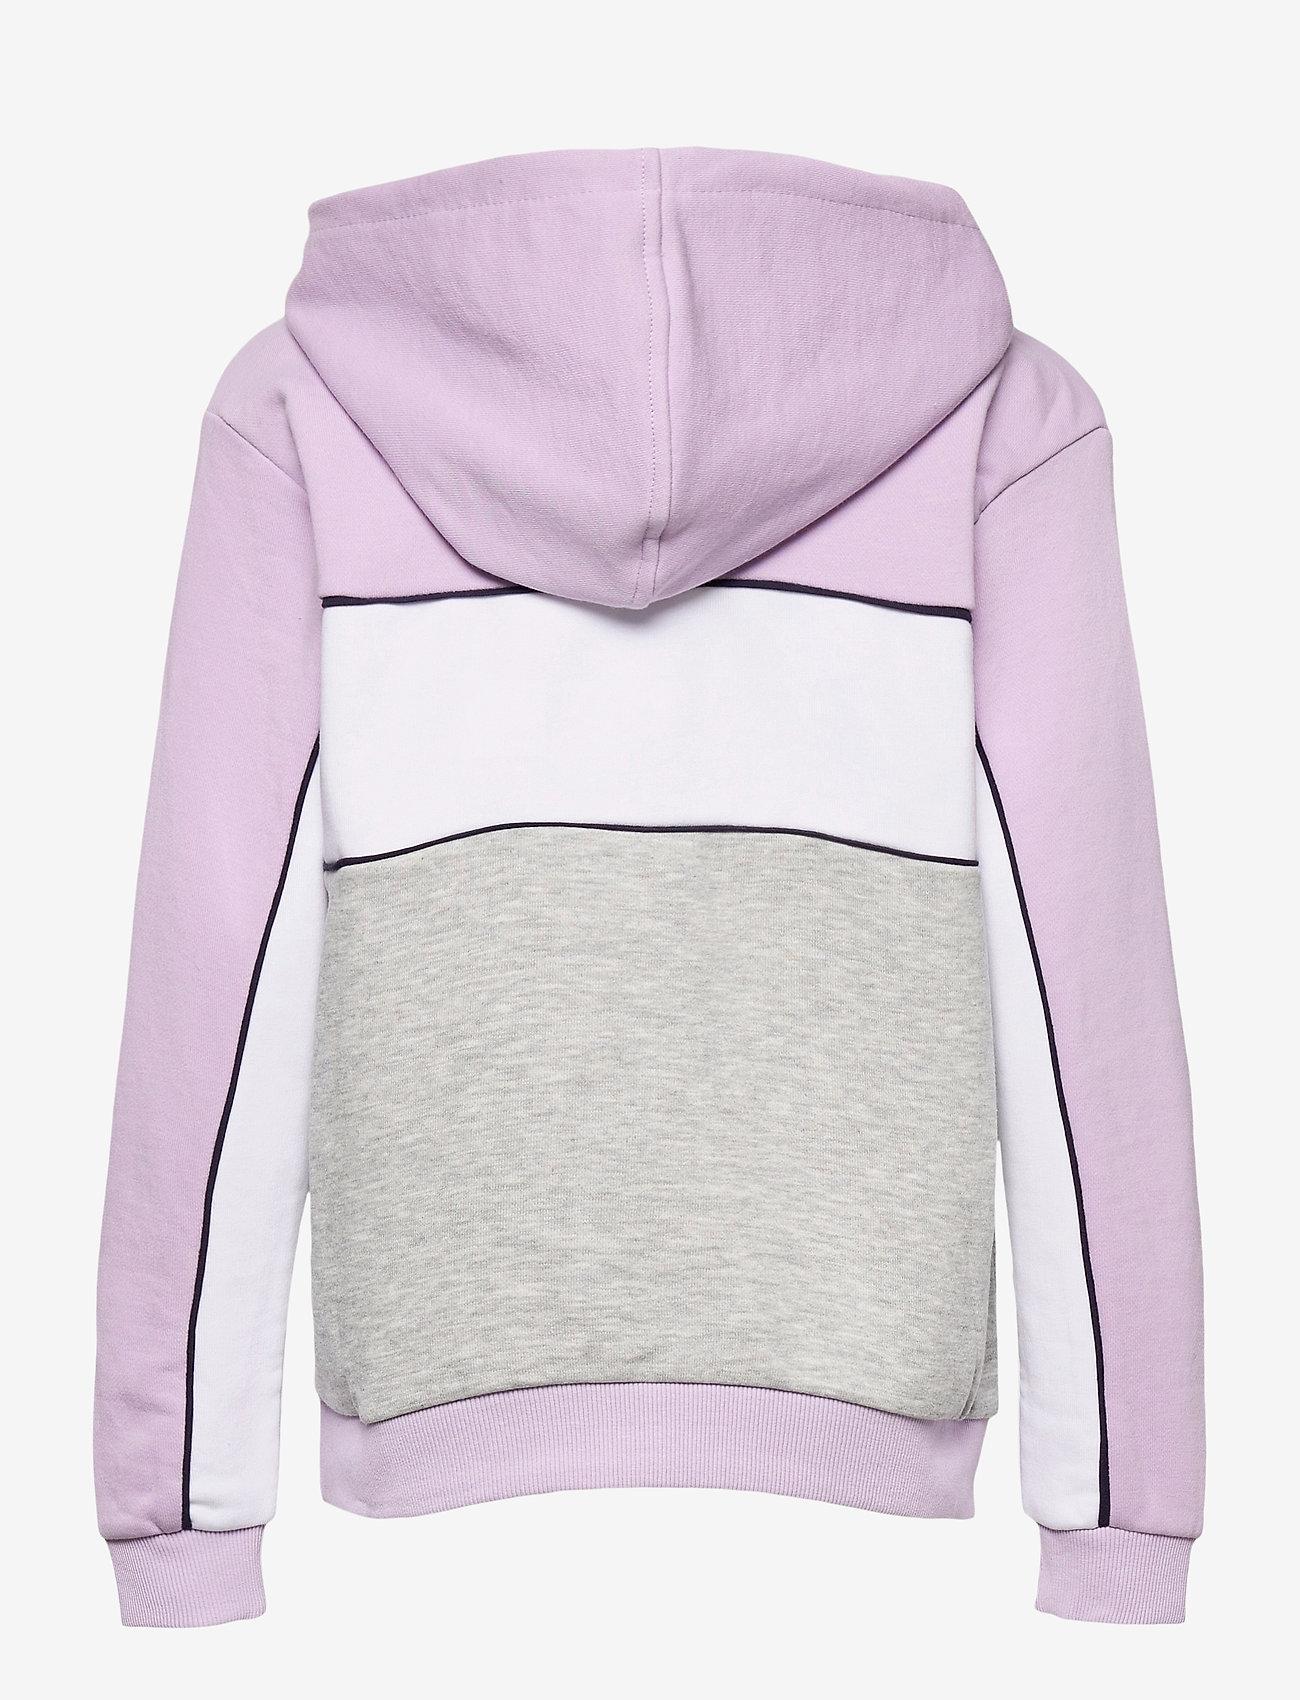 FILA - TEENS GIRLS TRACY hoody - hoodies - light grey melange bros-pastel lilac-brighte white - 1